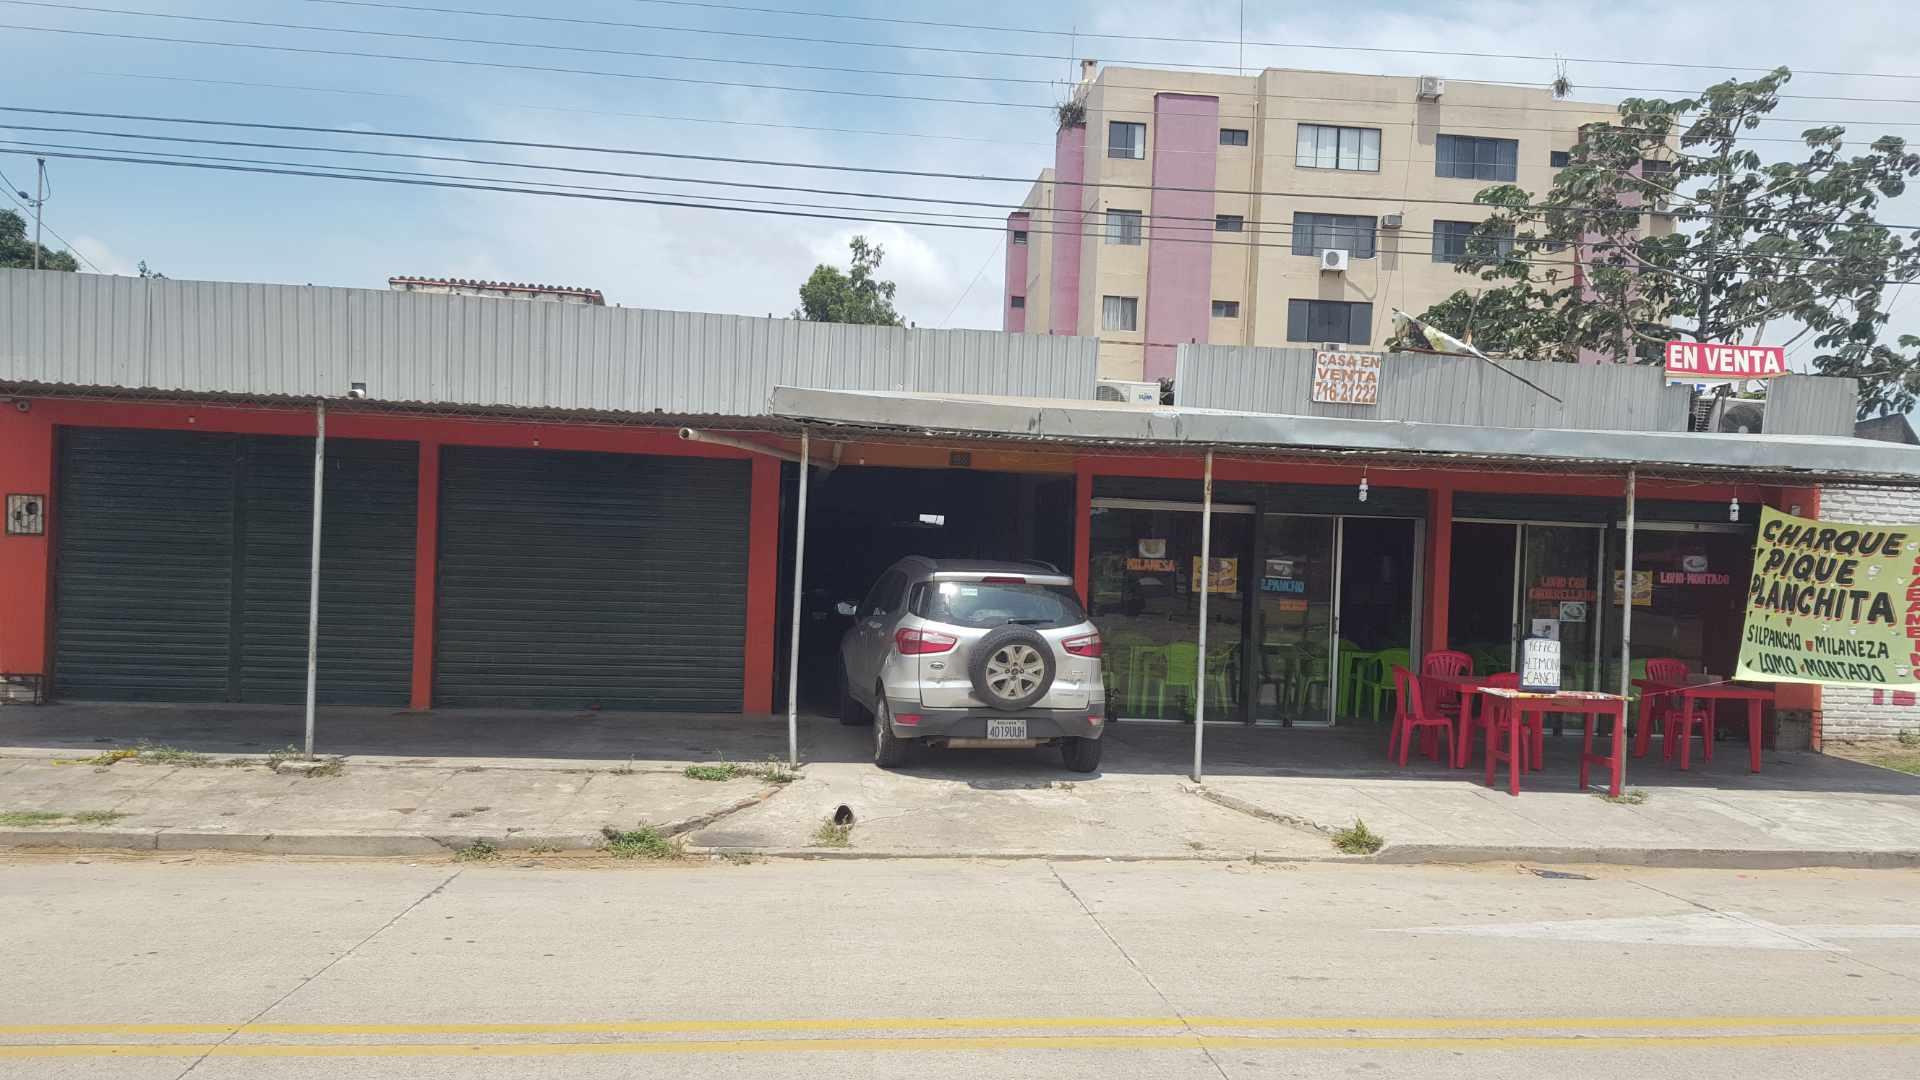 Local comercial en Venta Av. Rolando de Chazal a 10 mts del 4to anillo, amplia avenida pavimentada entre Brasil y Virgen de Cotoca Foto 1